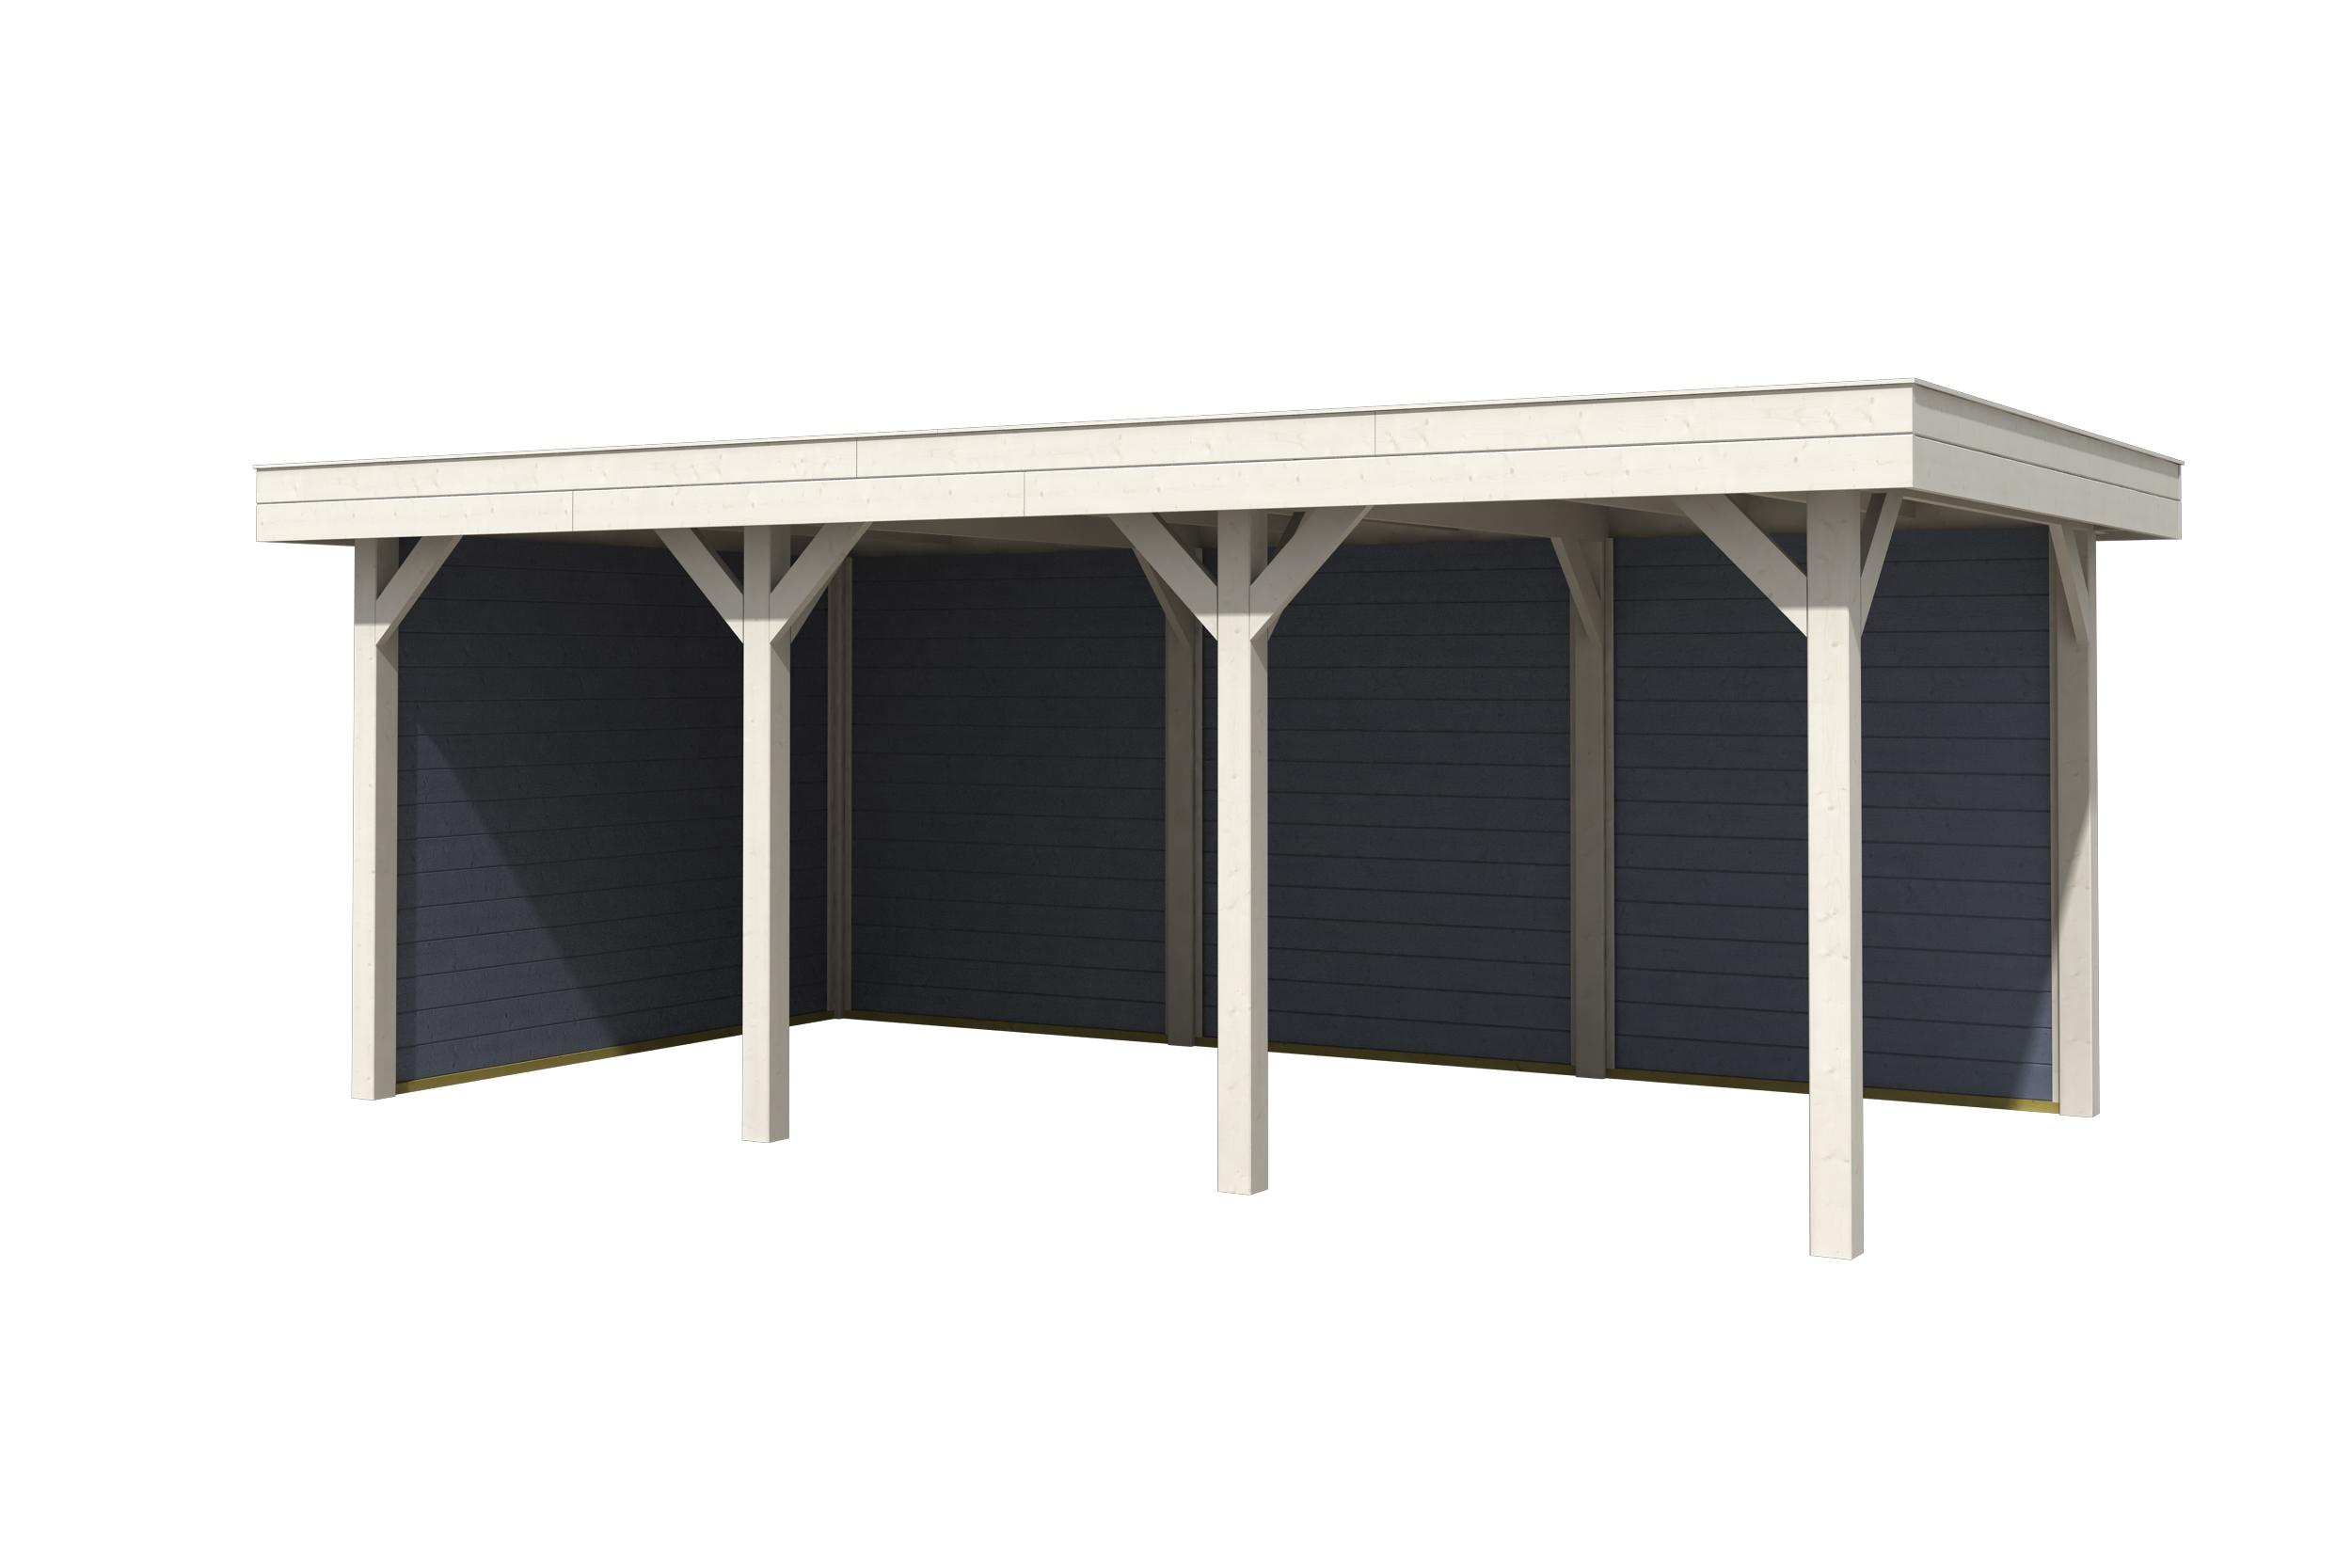 Westwood | Outdoor Living 6030 20 Plus | Pigeon Blue | 588x304 cm